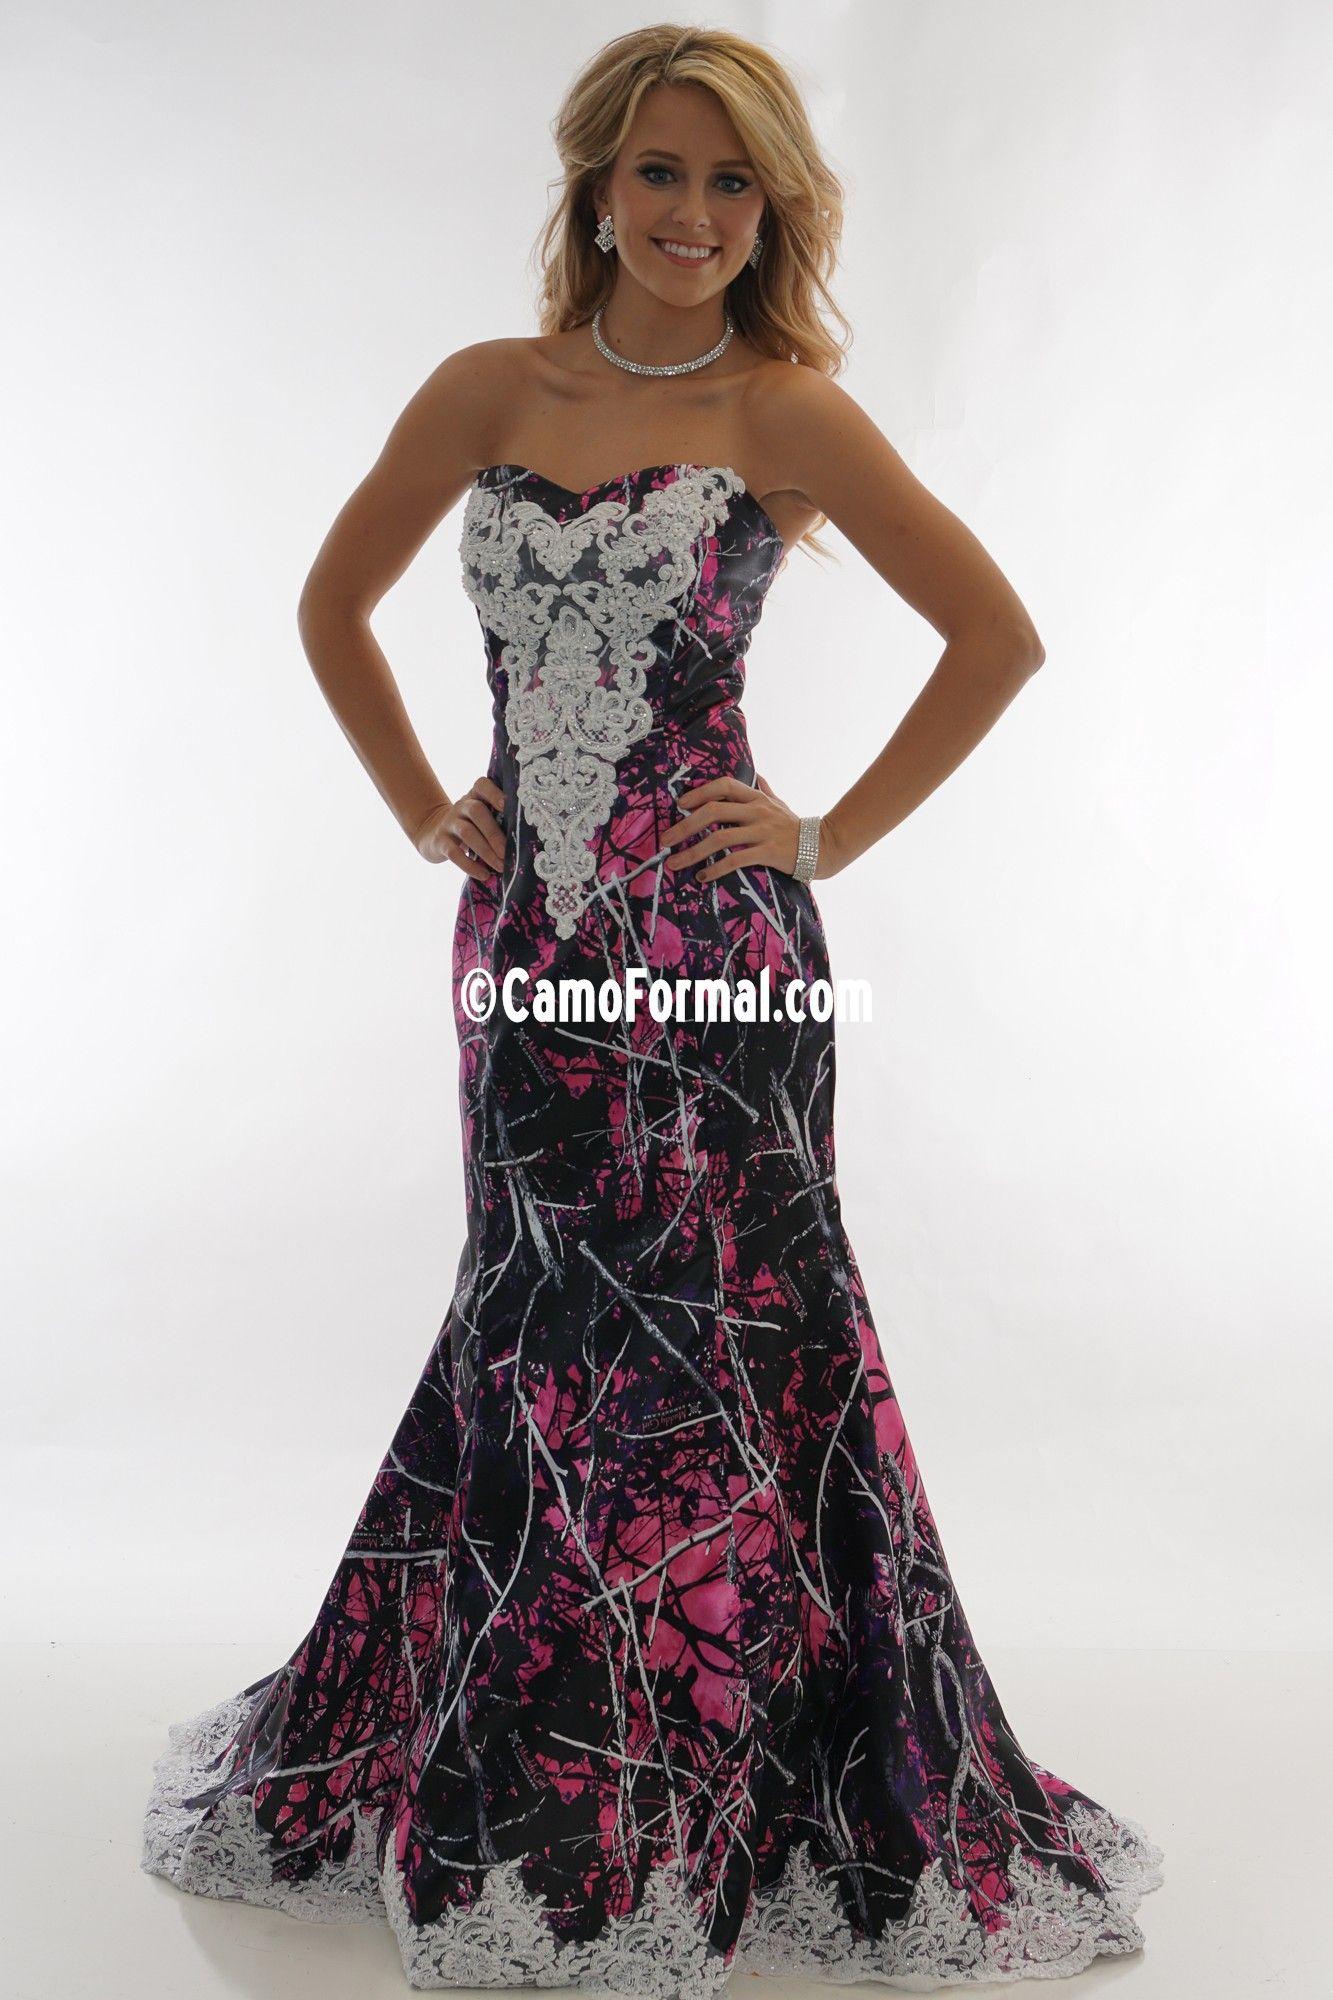 3887 Ellen New Applique Muddy Girl Camo Wedding Dresses Girls